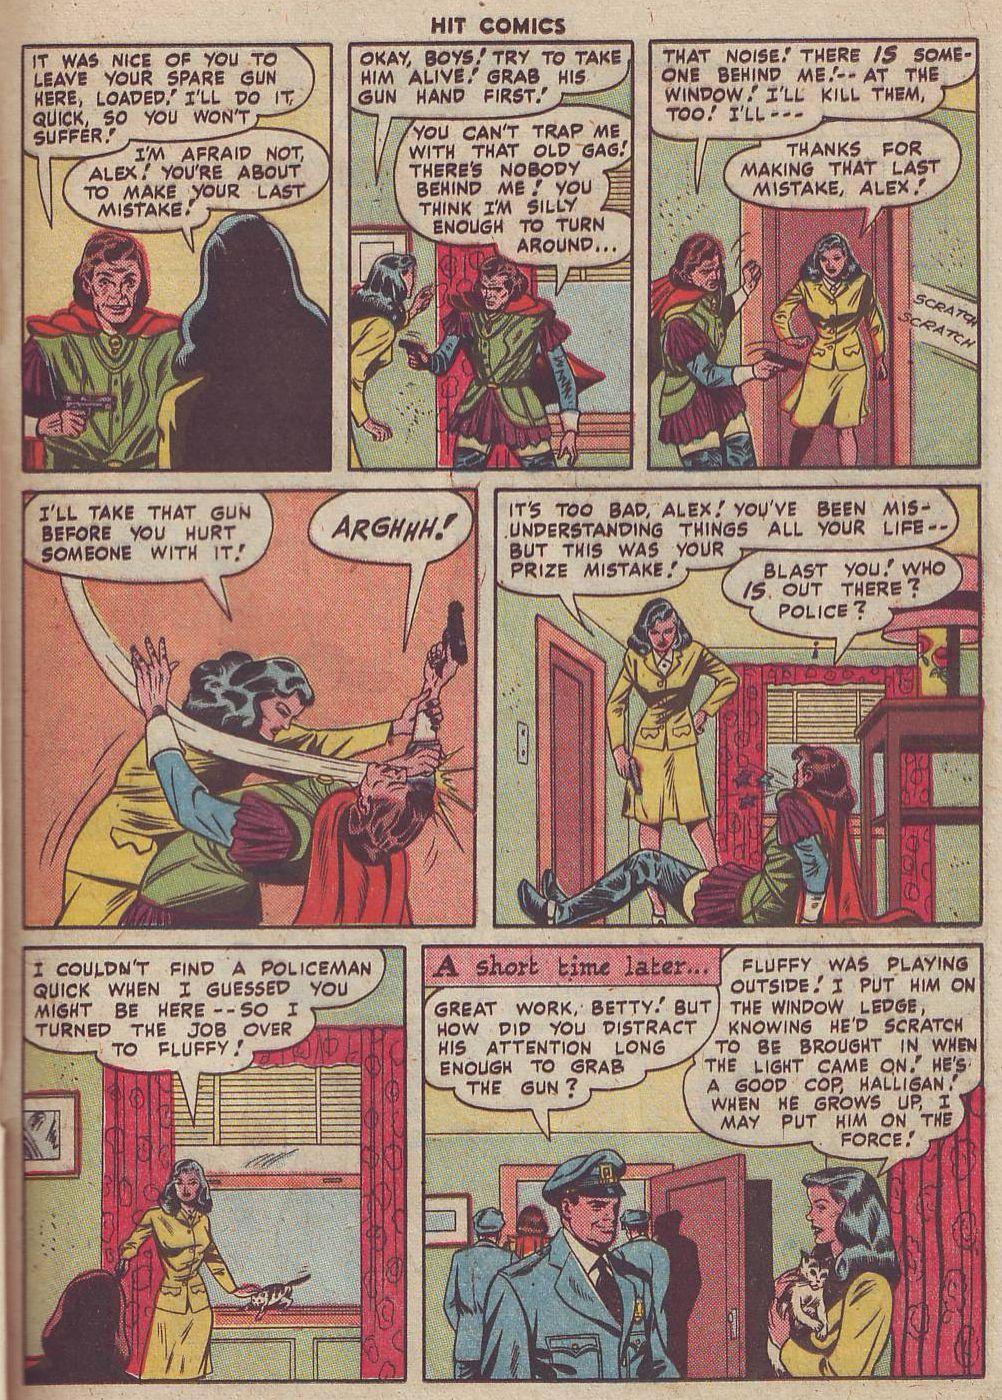 Read online Hit Comics comic -  Issue #51 - 31